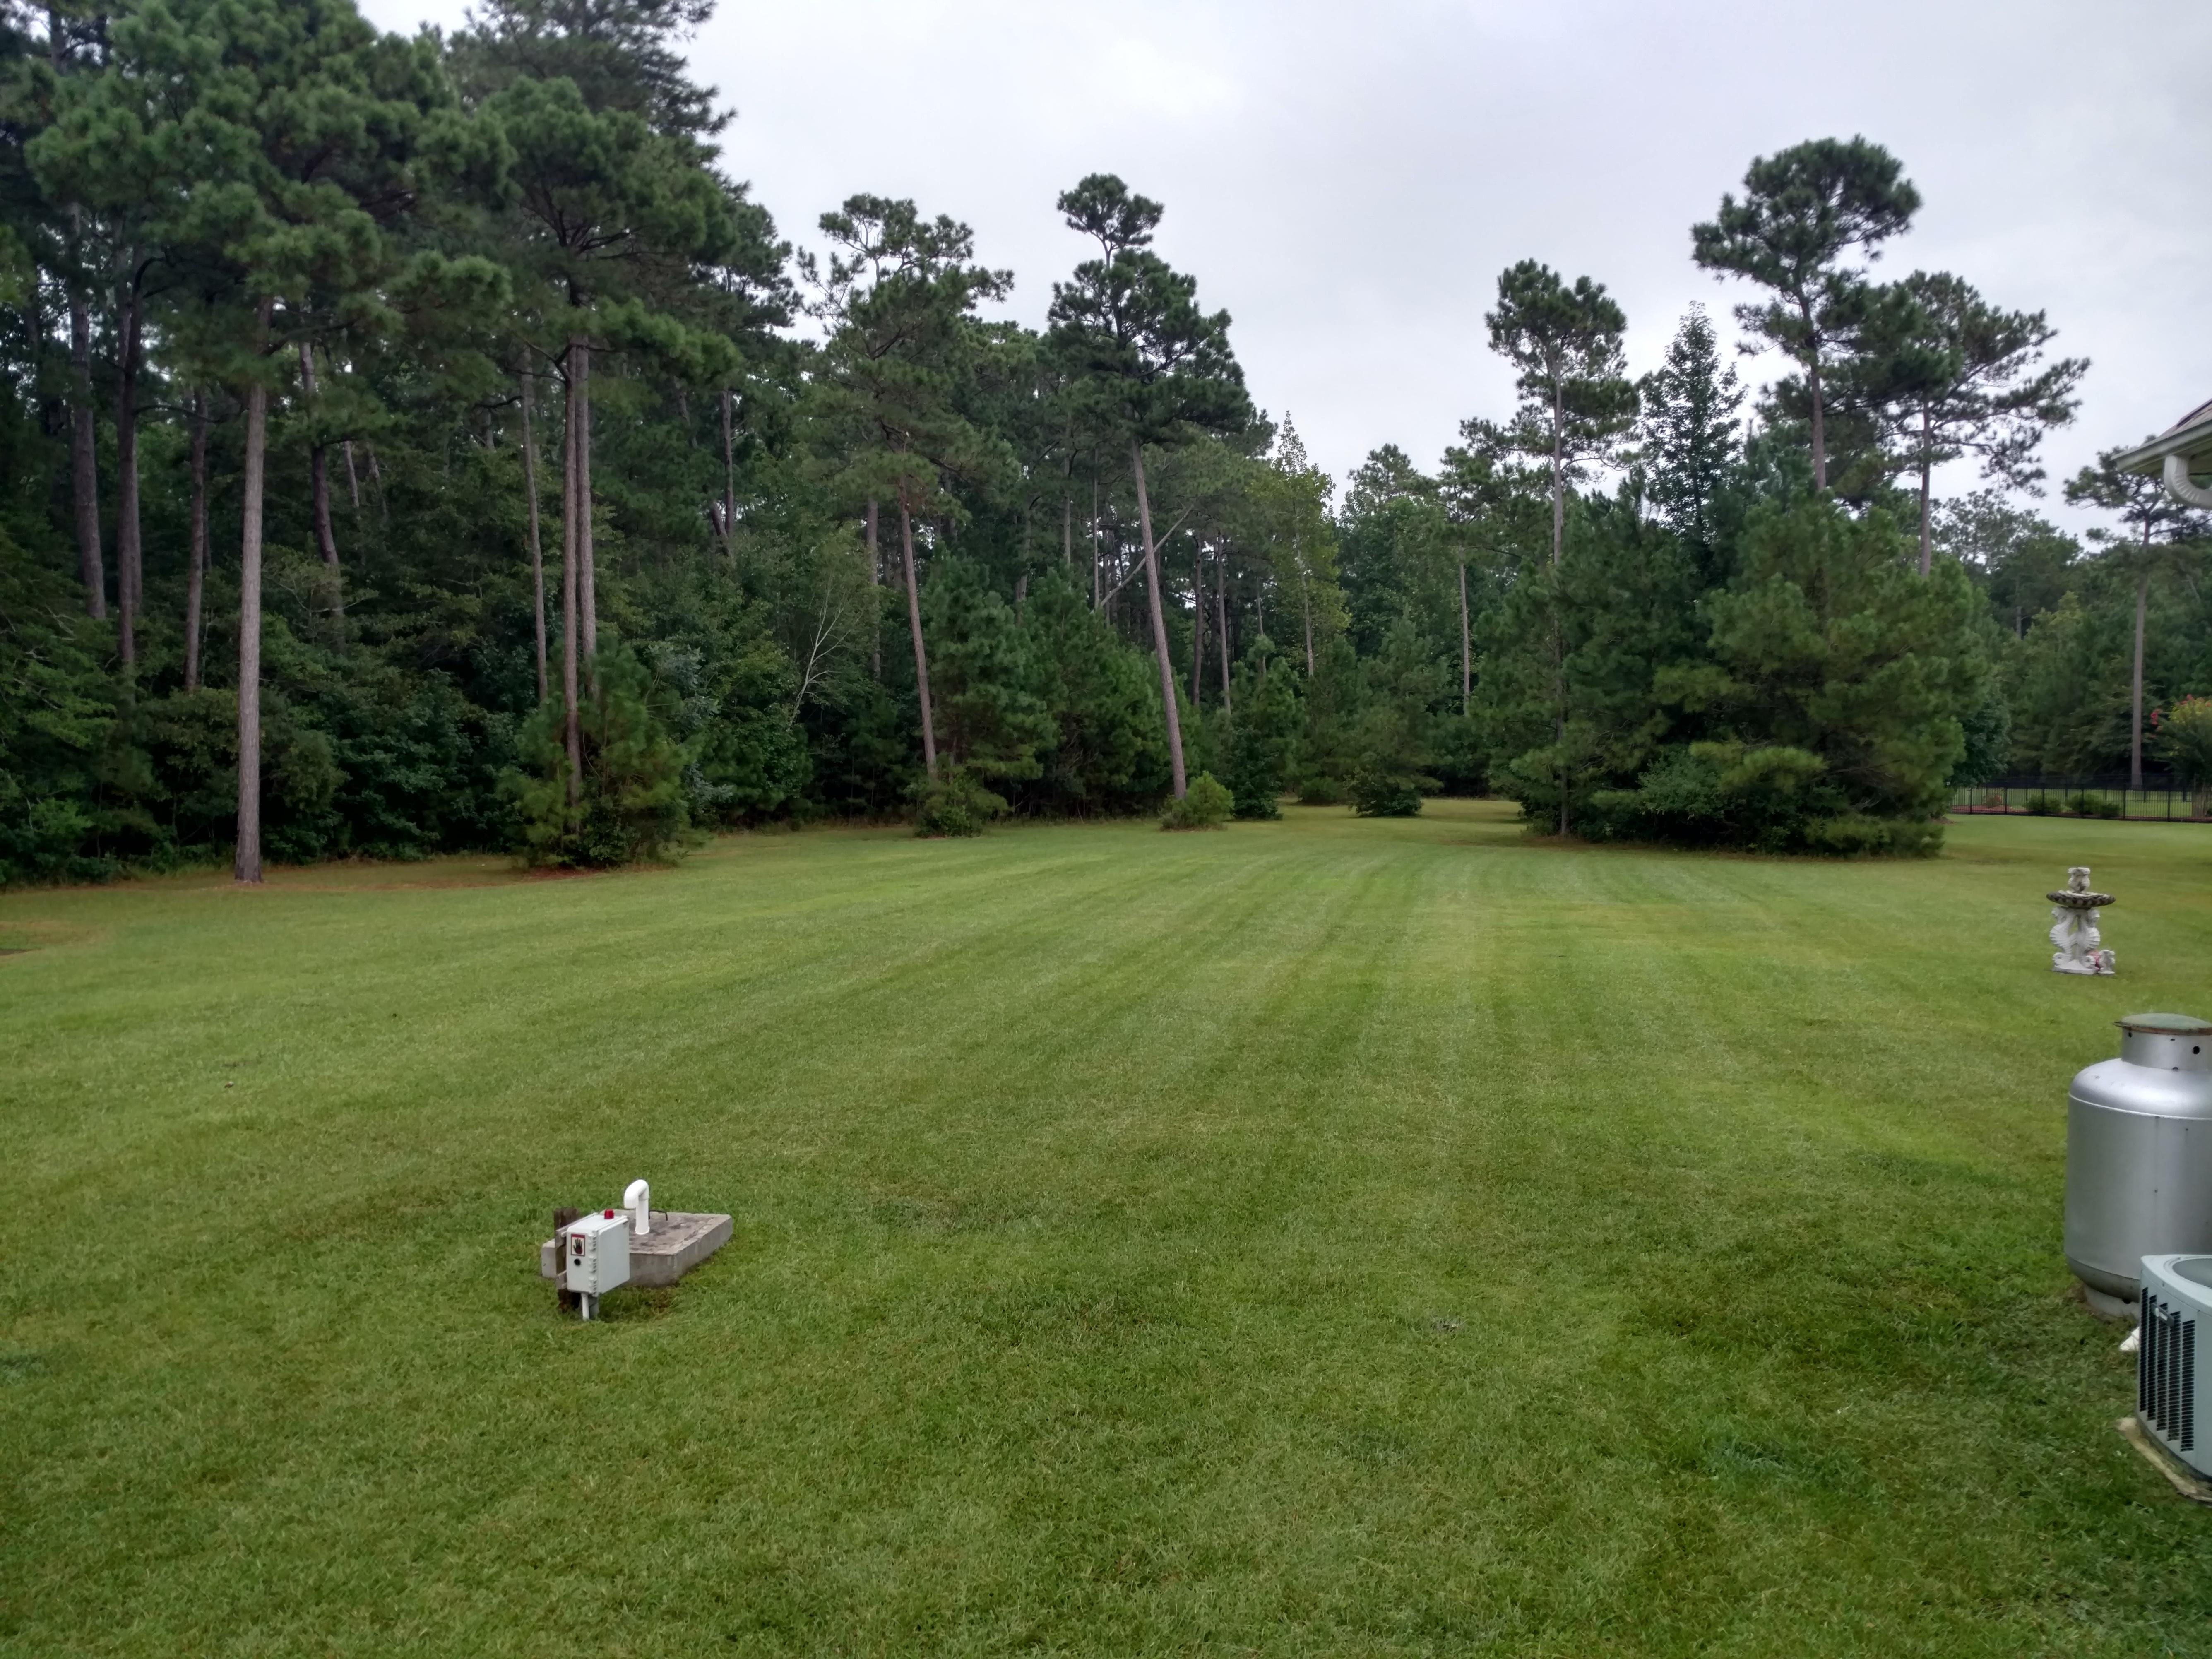 lawn service yard mowing